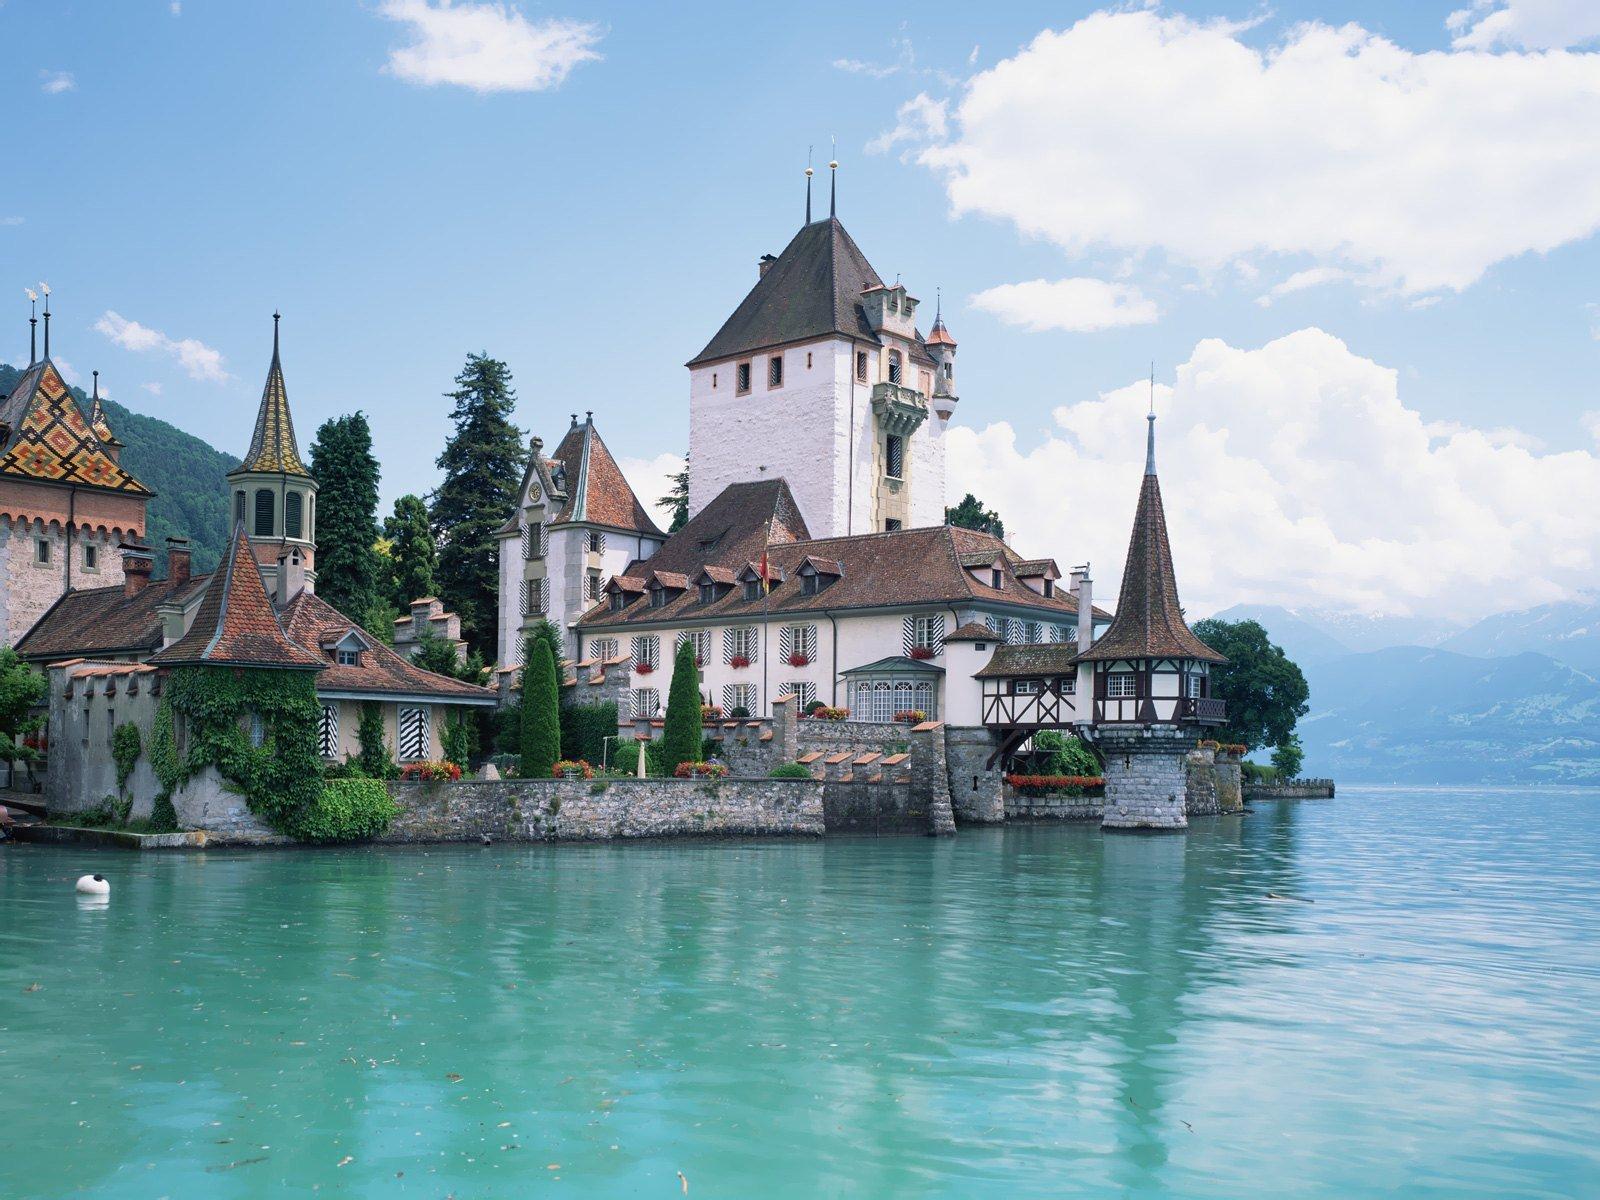 http://4.bp.blogspot.com/-rF8TxpUV8GU/TZkSK5OlbBI/AAAAAAAAAdY/J4_2GeZvp8I/s1600/Switzerland_8171_1600_1200.jpg